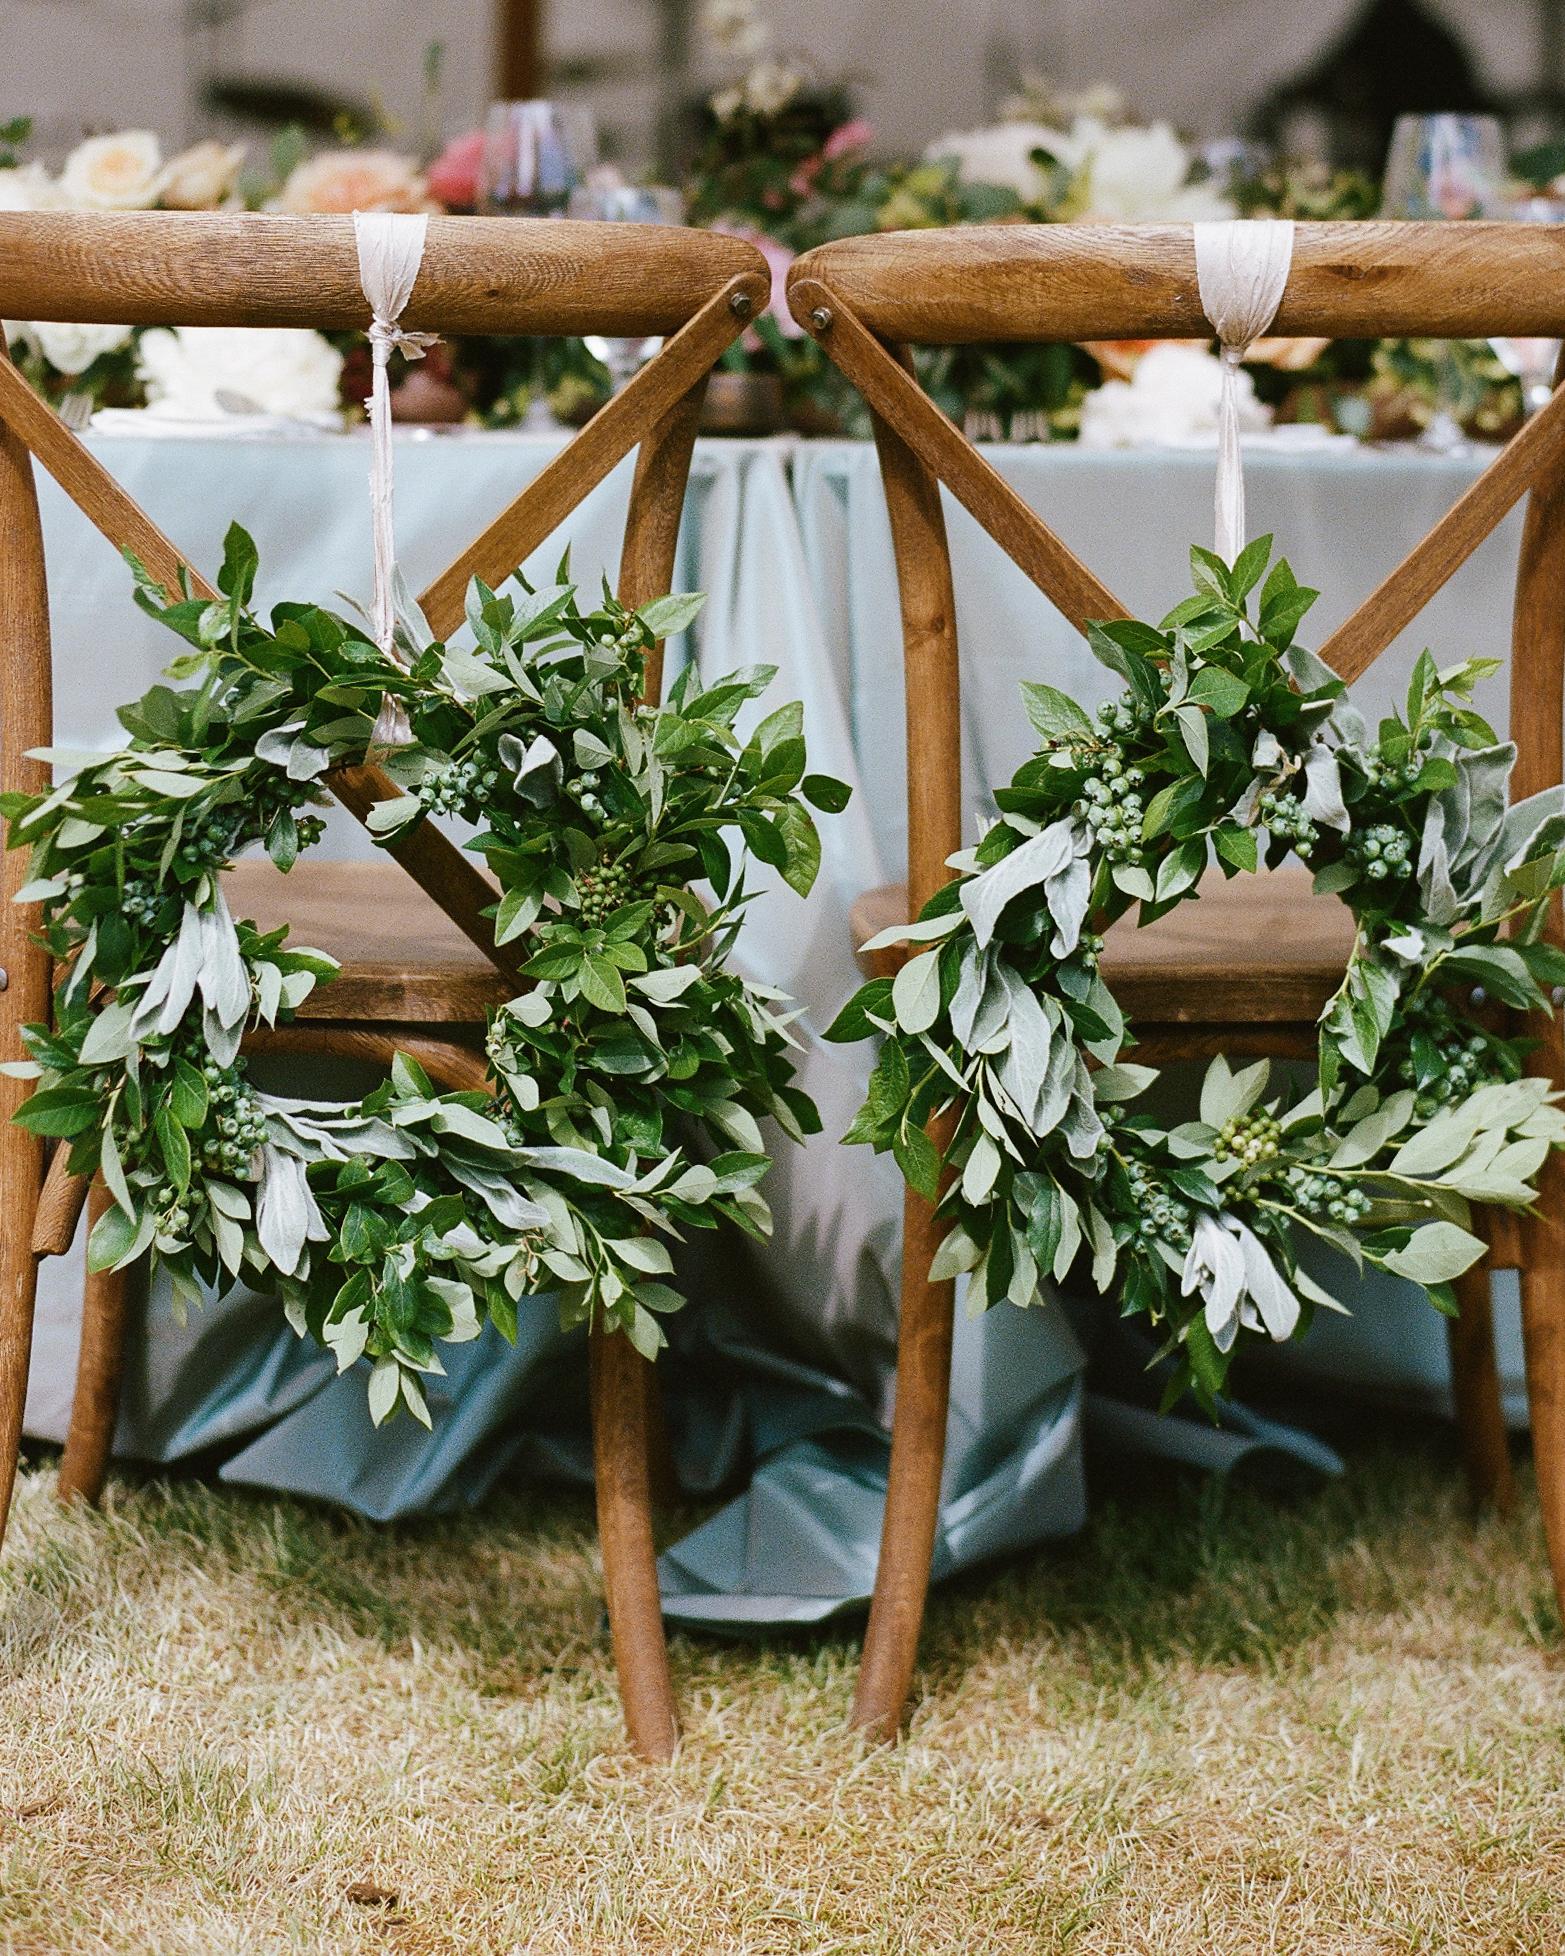 jamie-alex-wedding-wreaths-219-s111544-1014.jpg